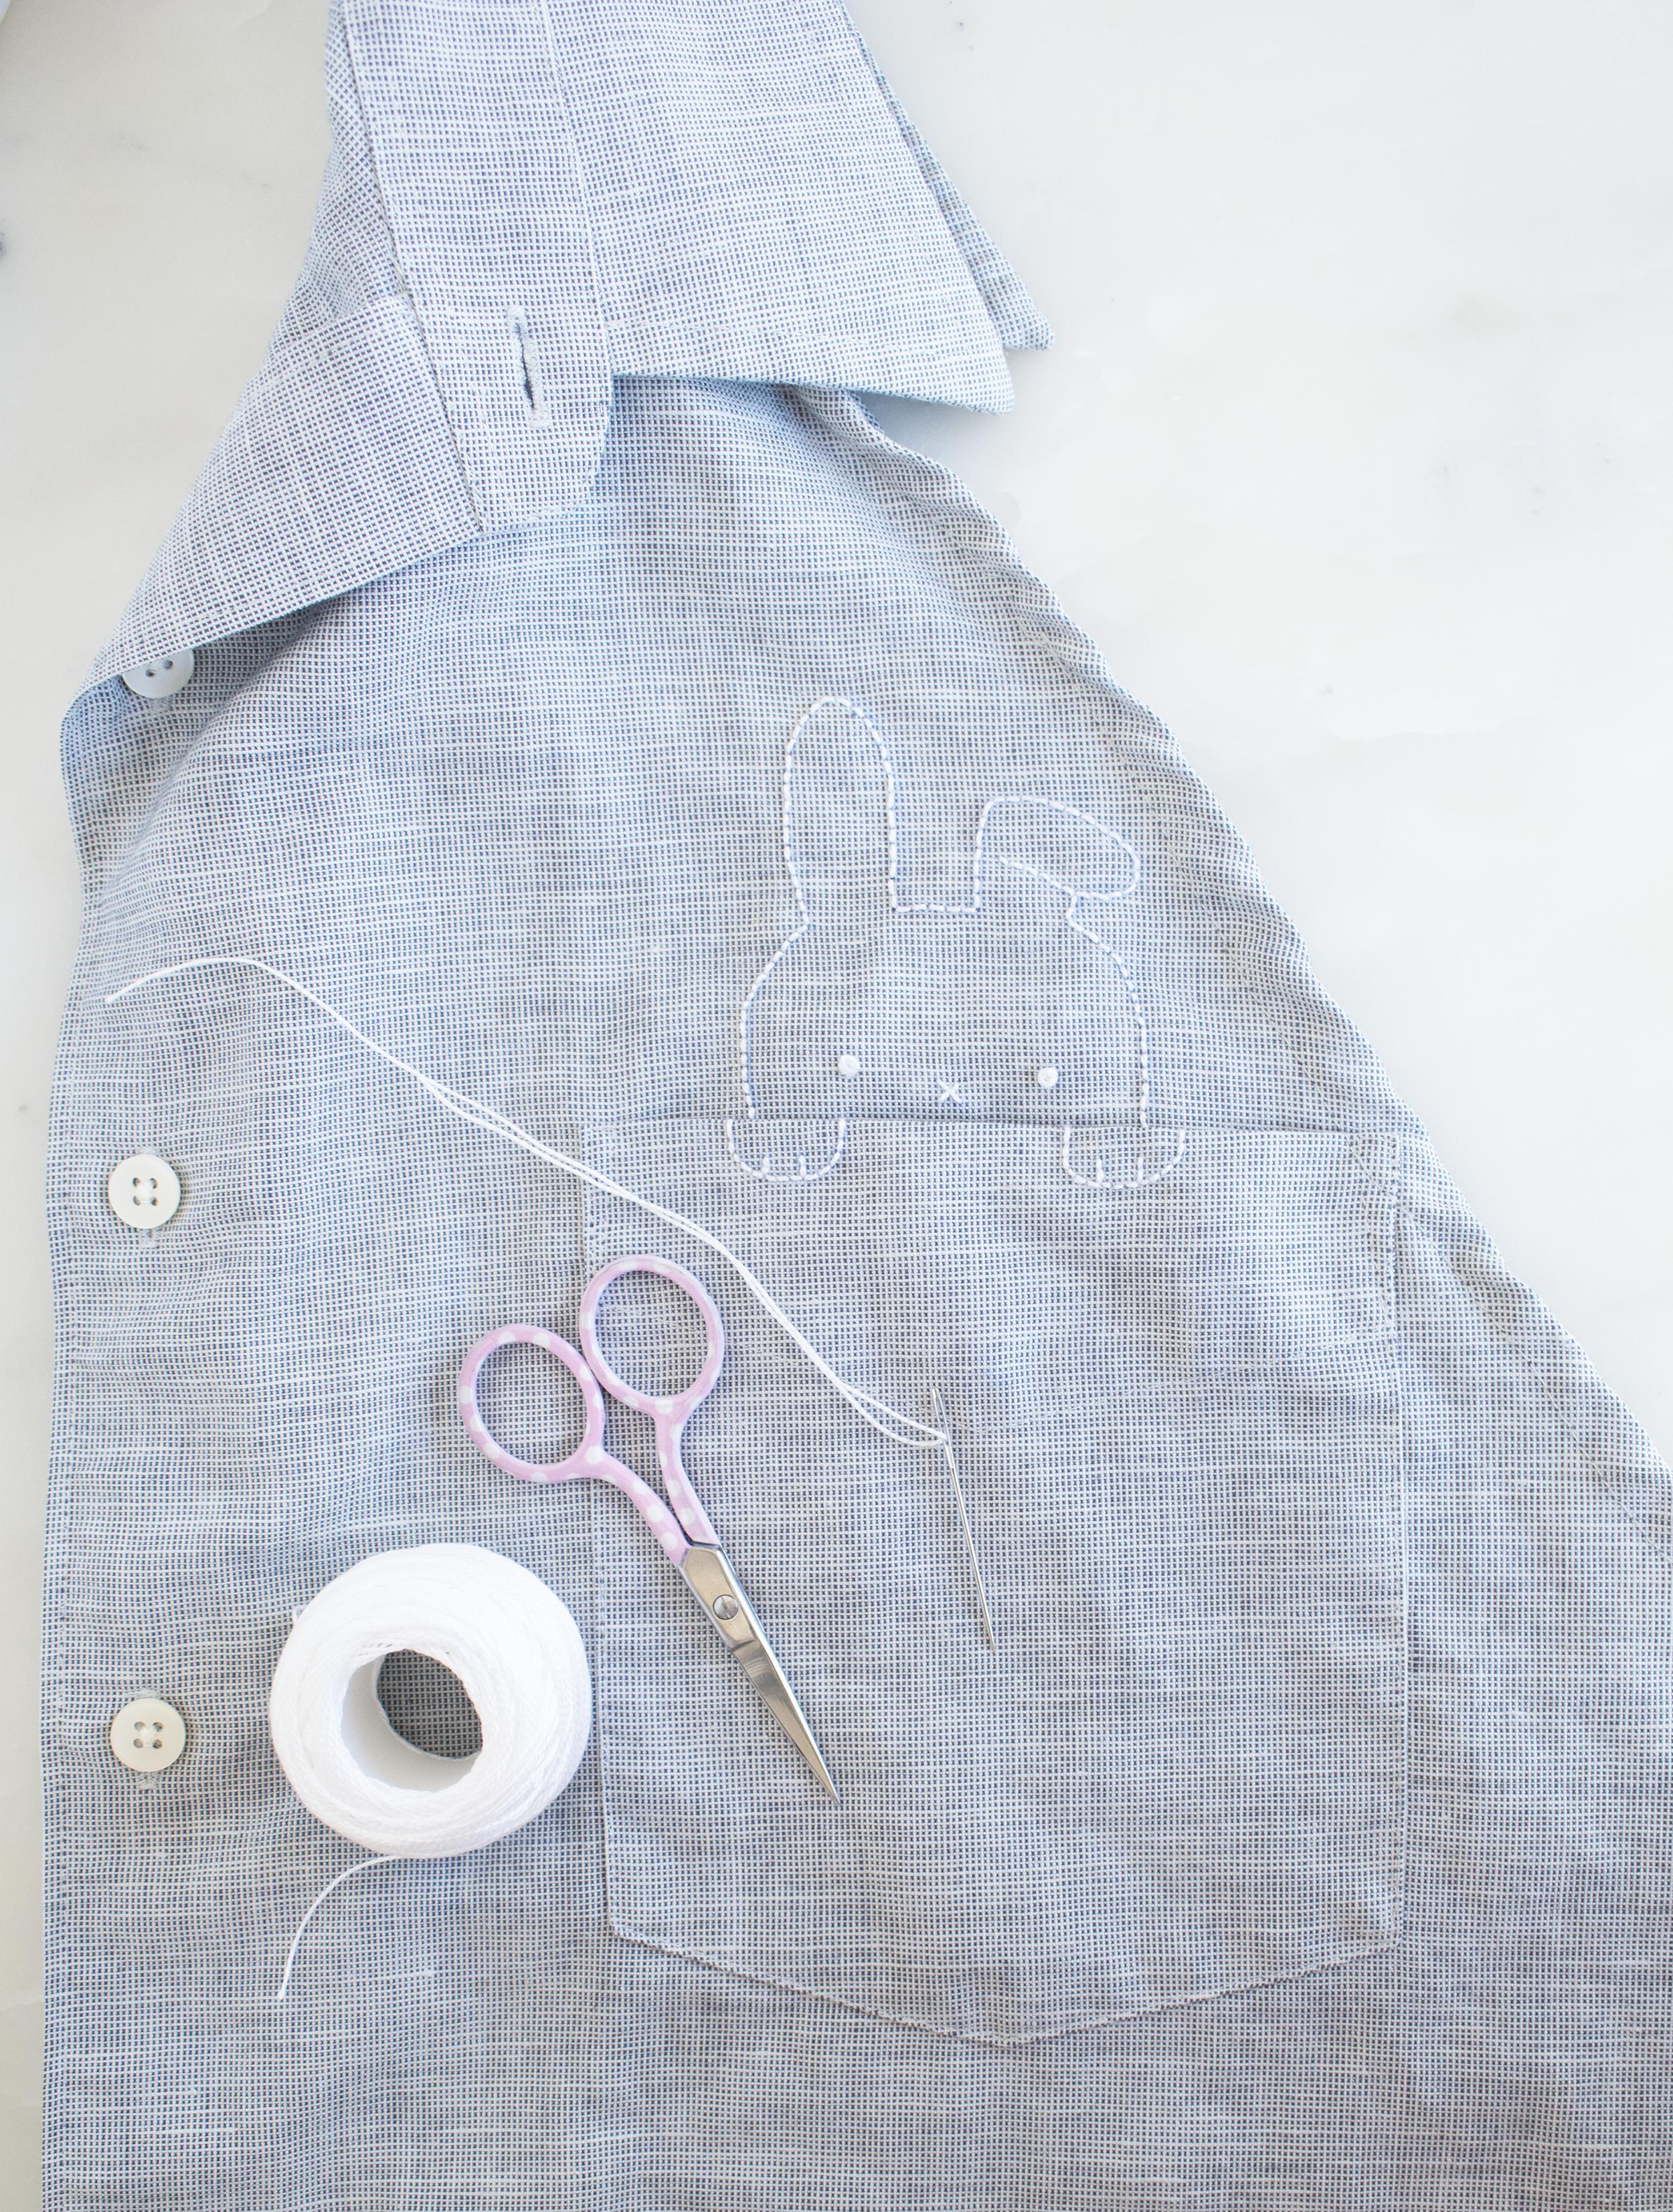 Embroidered Bunny Pocket | Sarah Makes Stuff